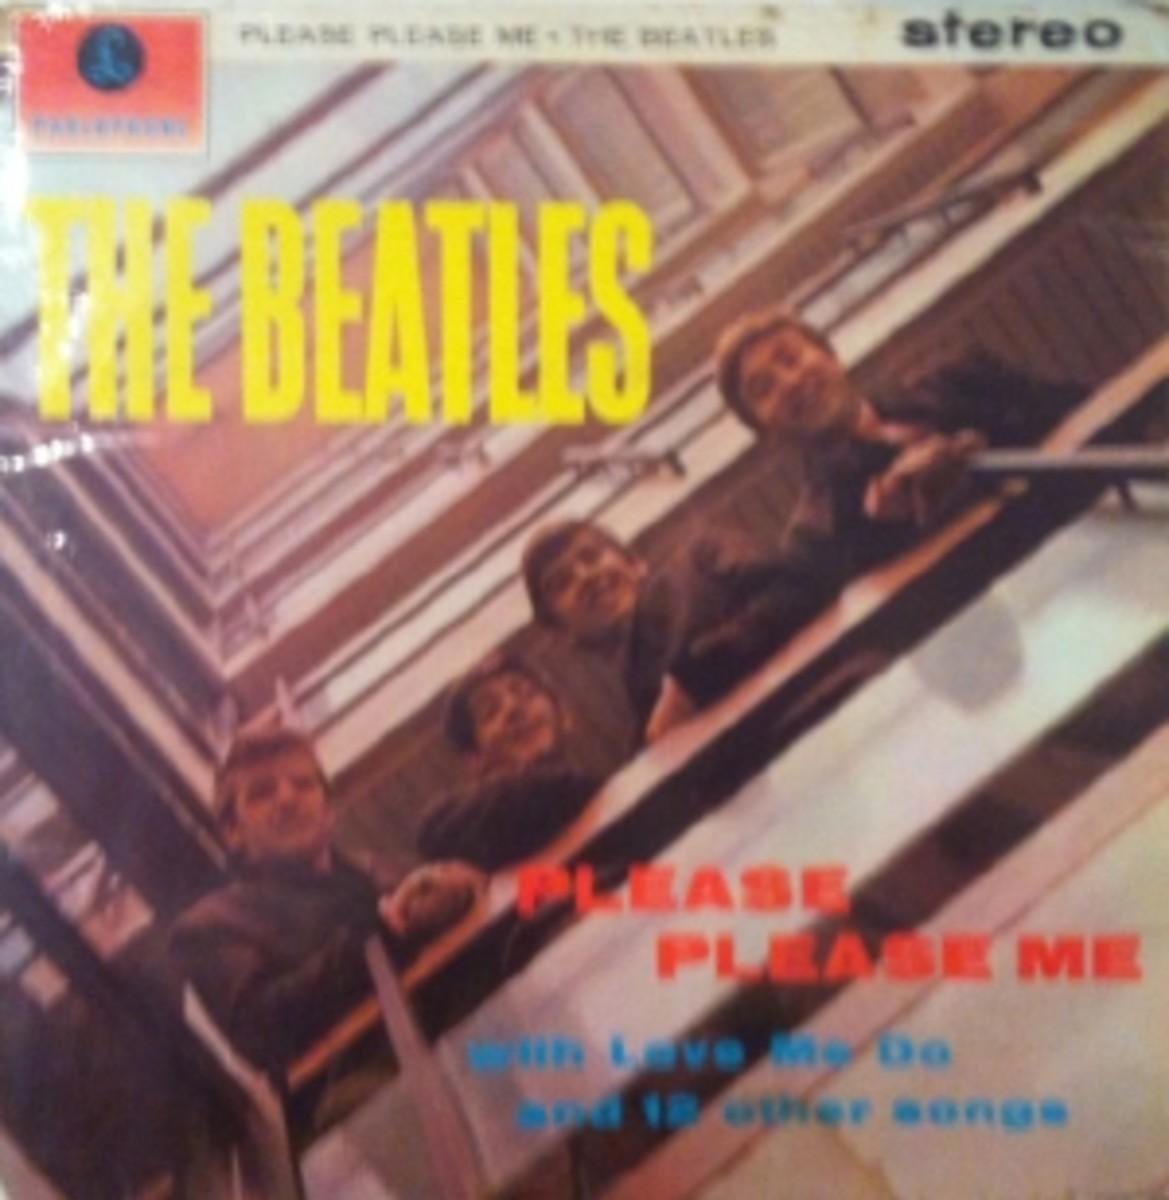 The-Beatles-Please-Please-Me-vintage-vinyl-record